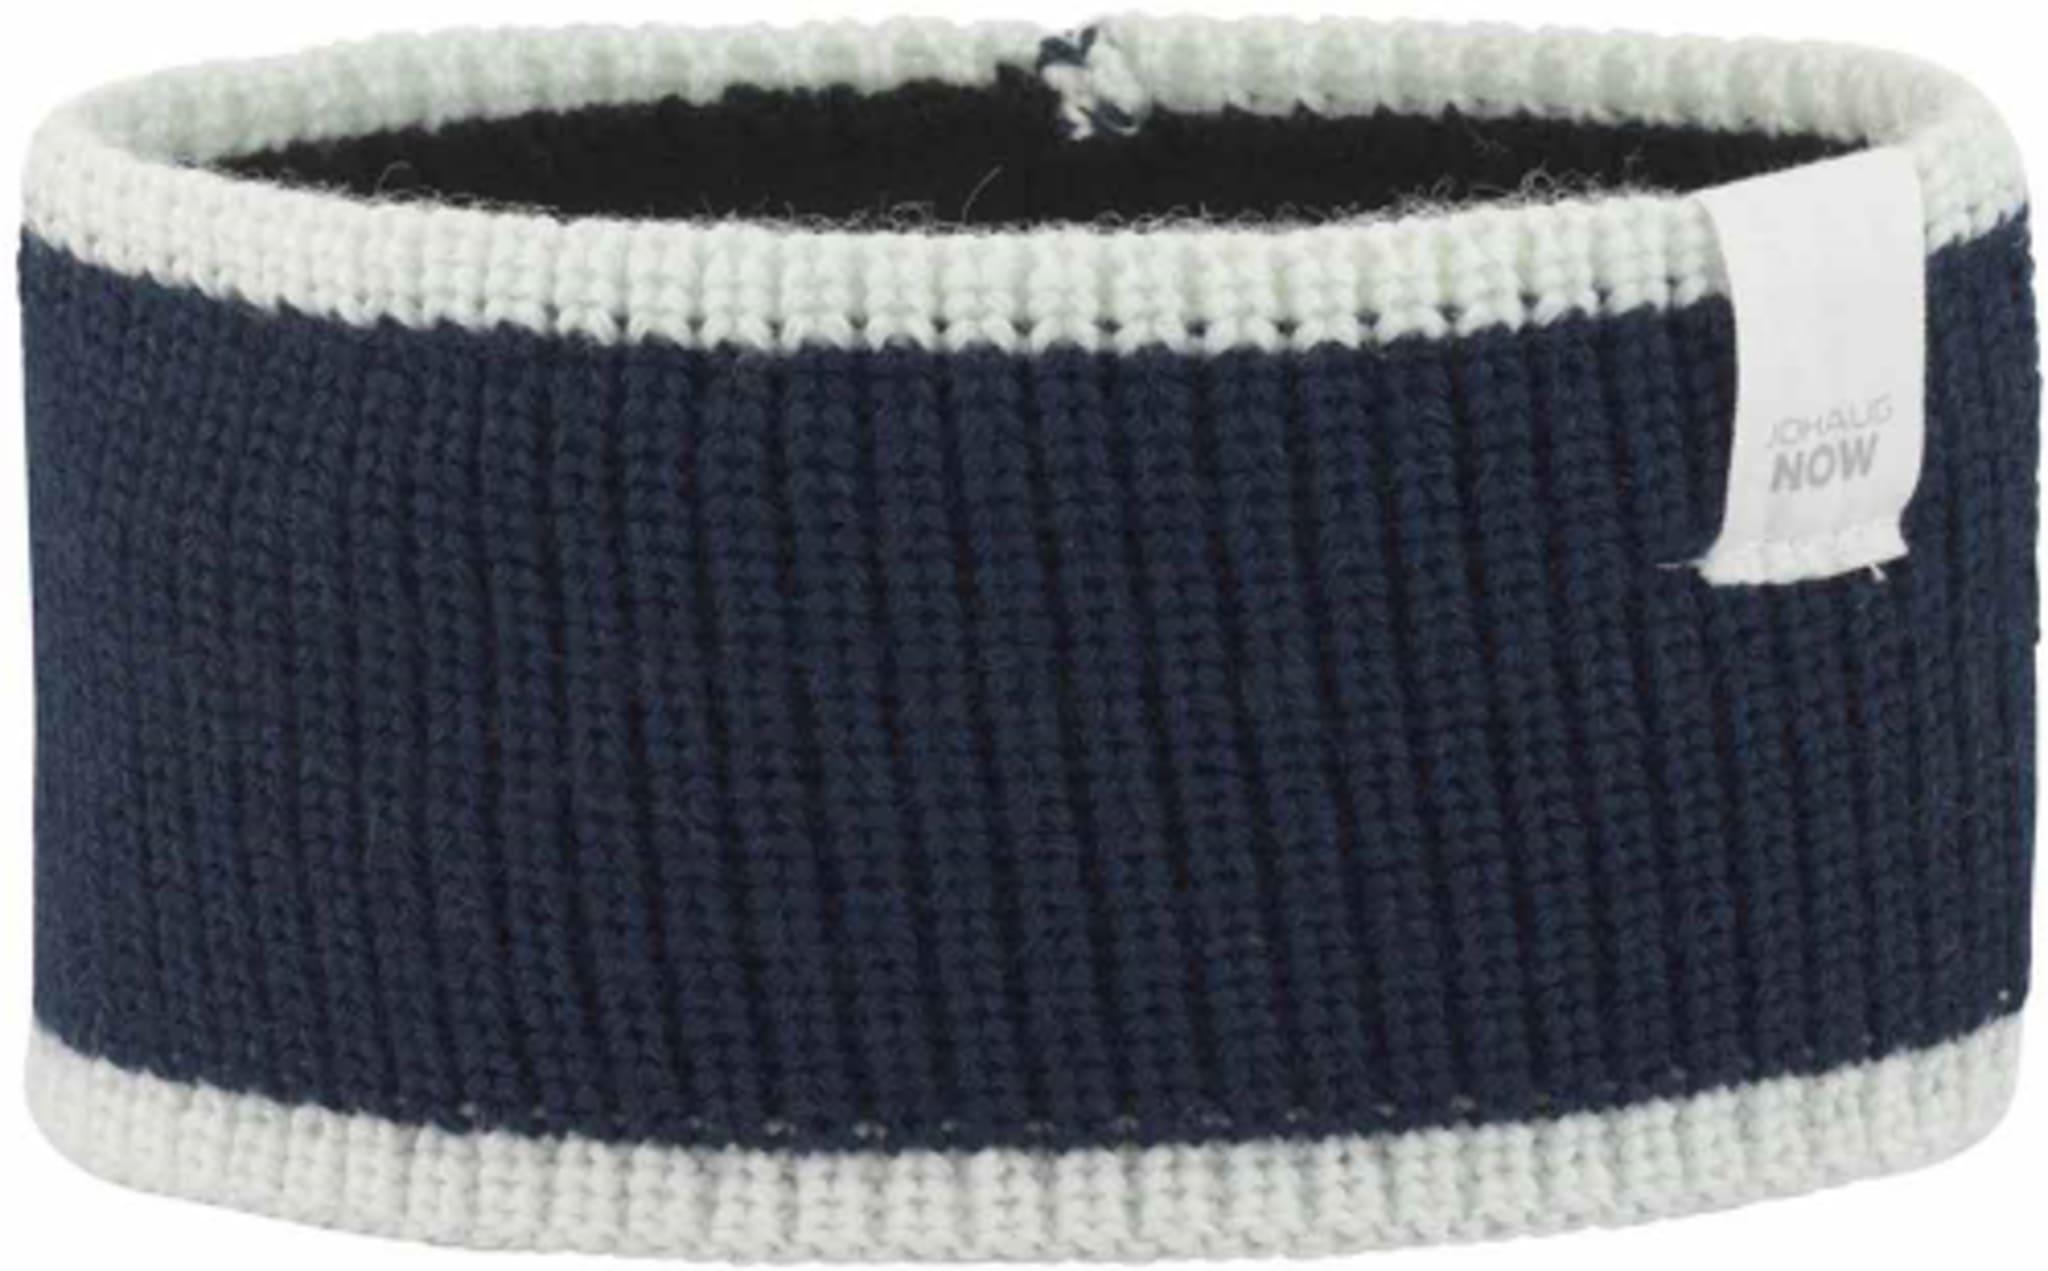 NOW Knit Wool Headband